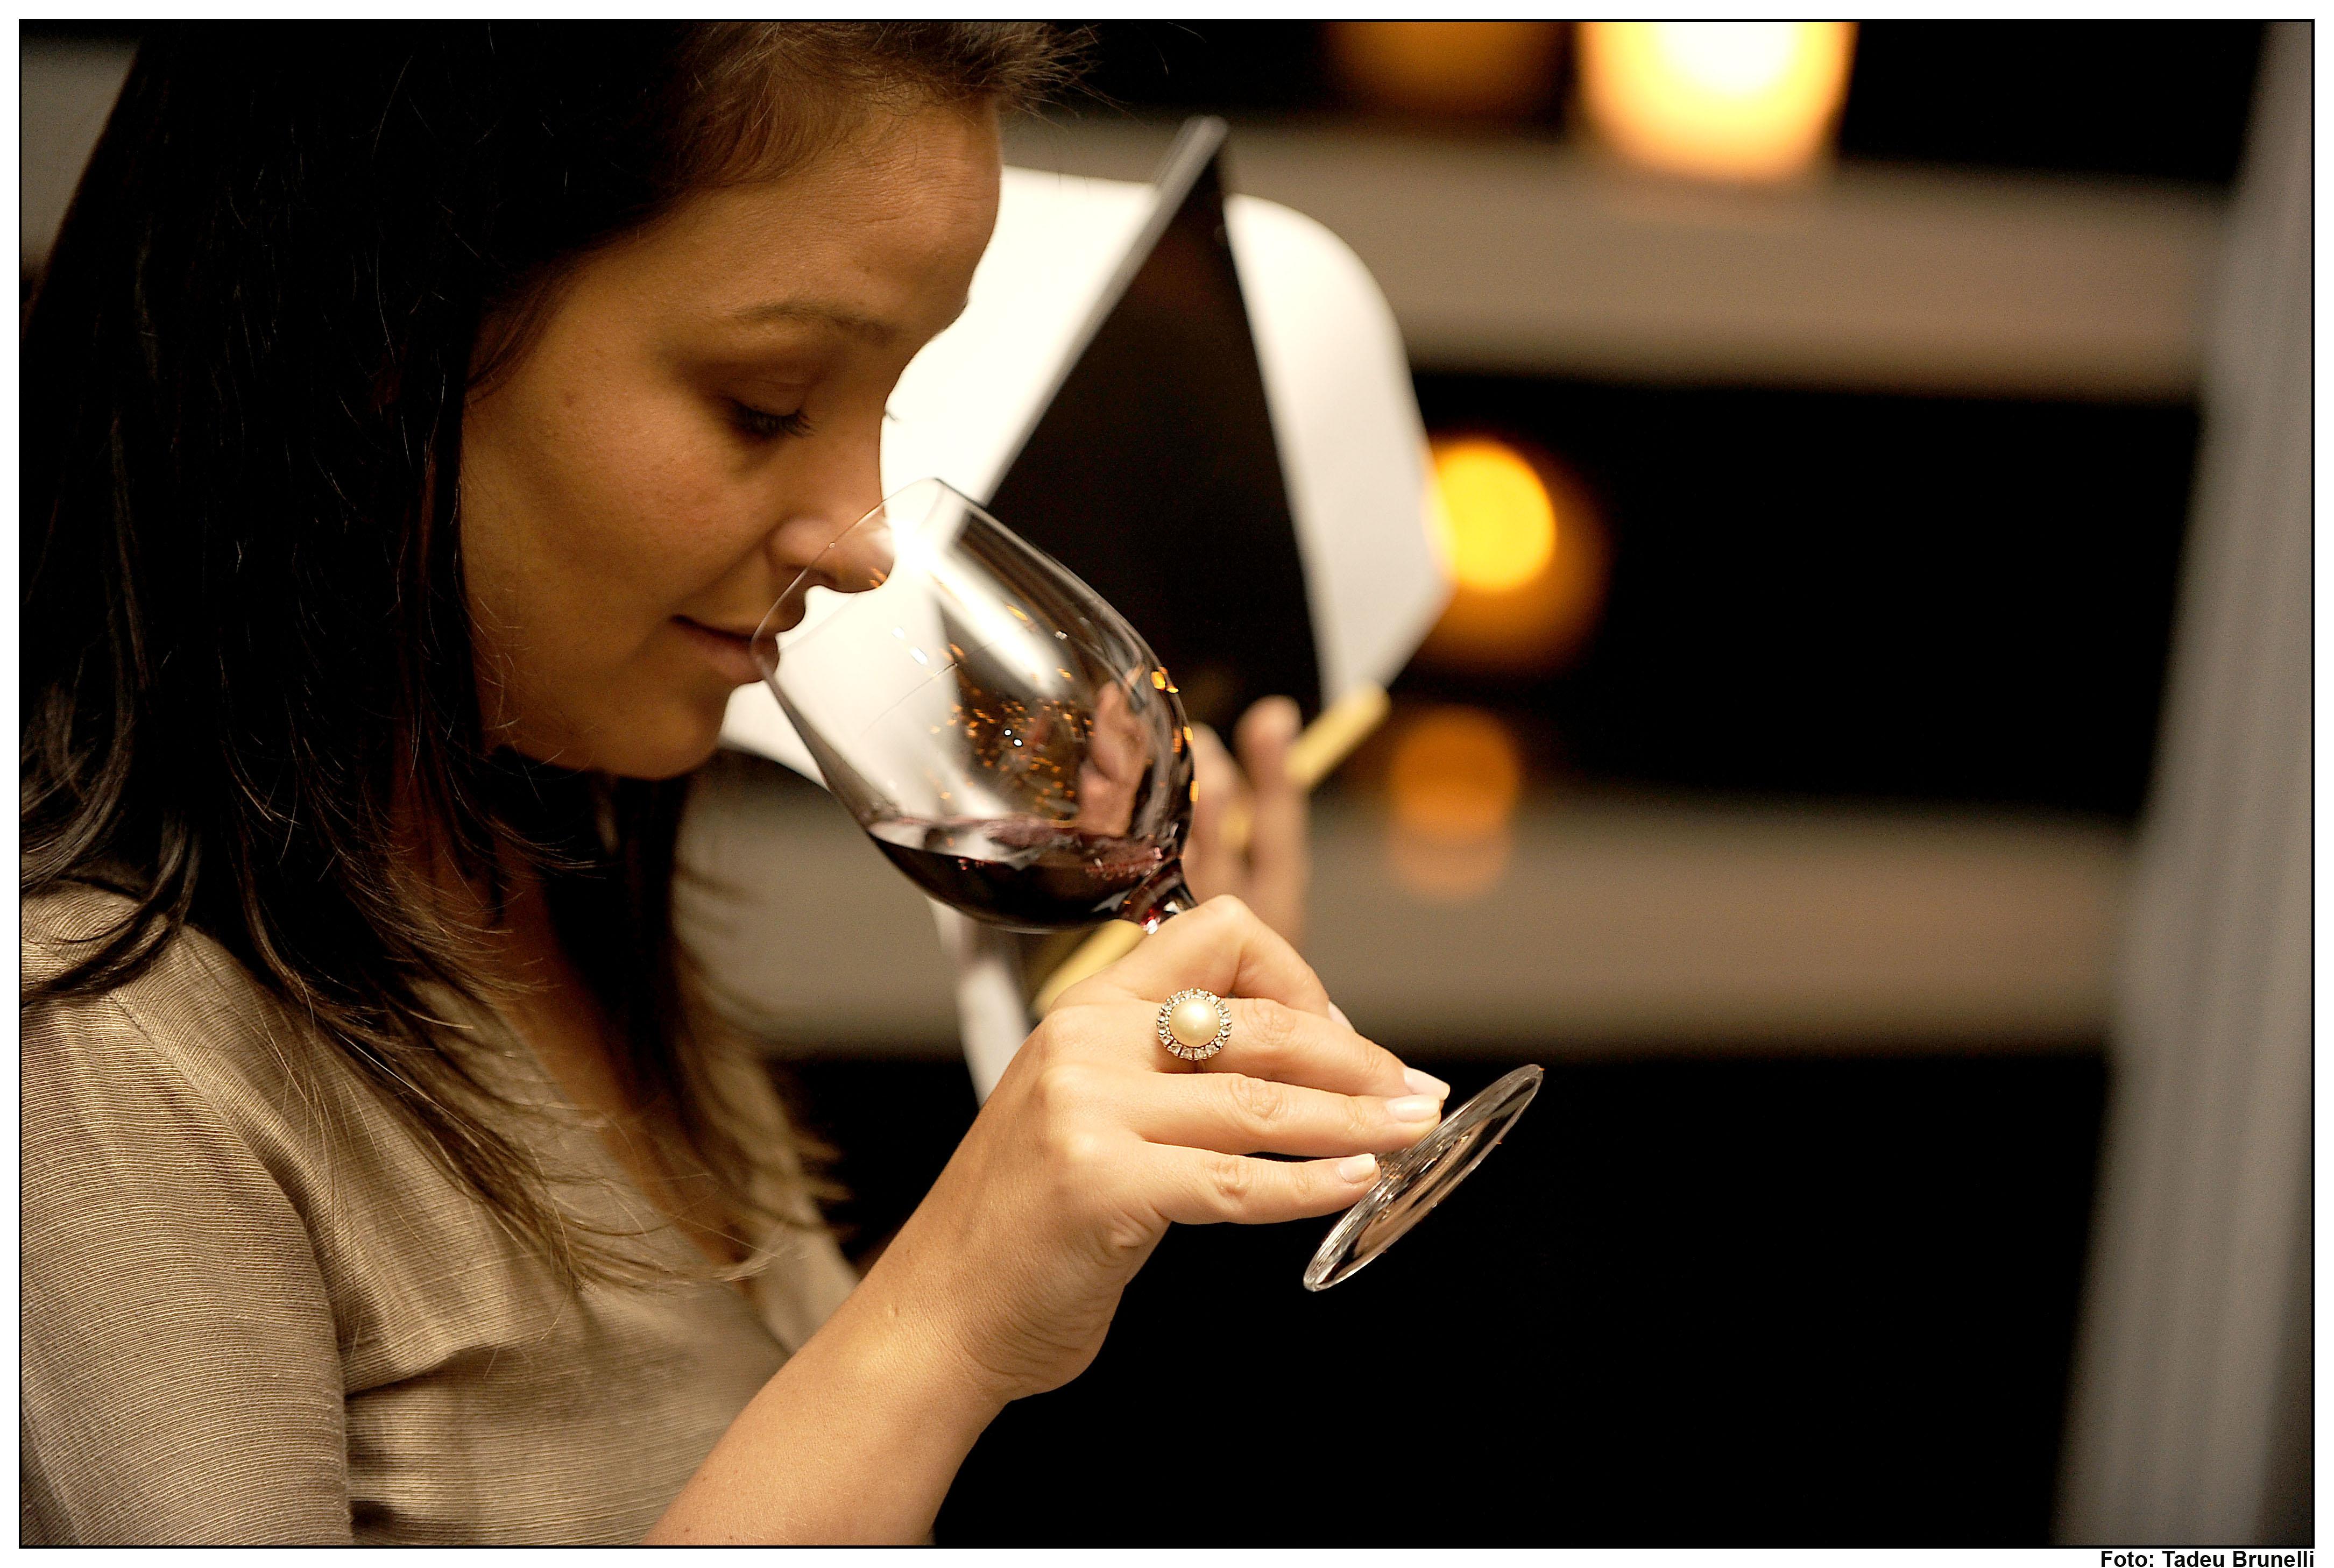 Hyatt Wine Club – Setembro 2012 | Vinhos da França